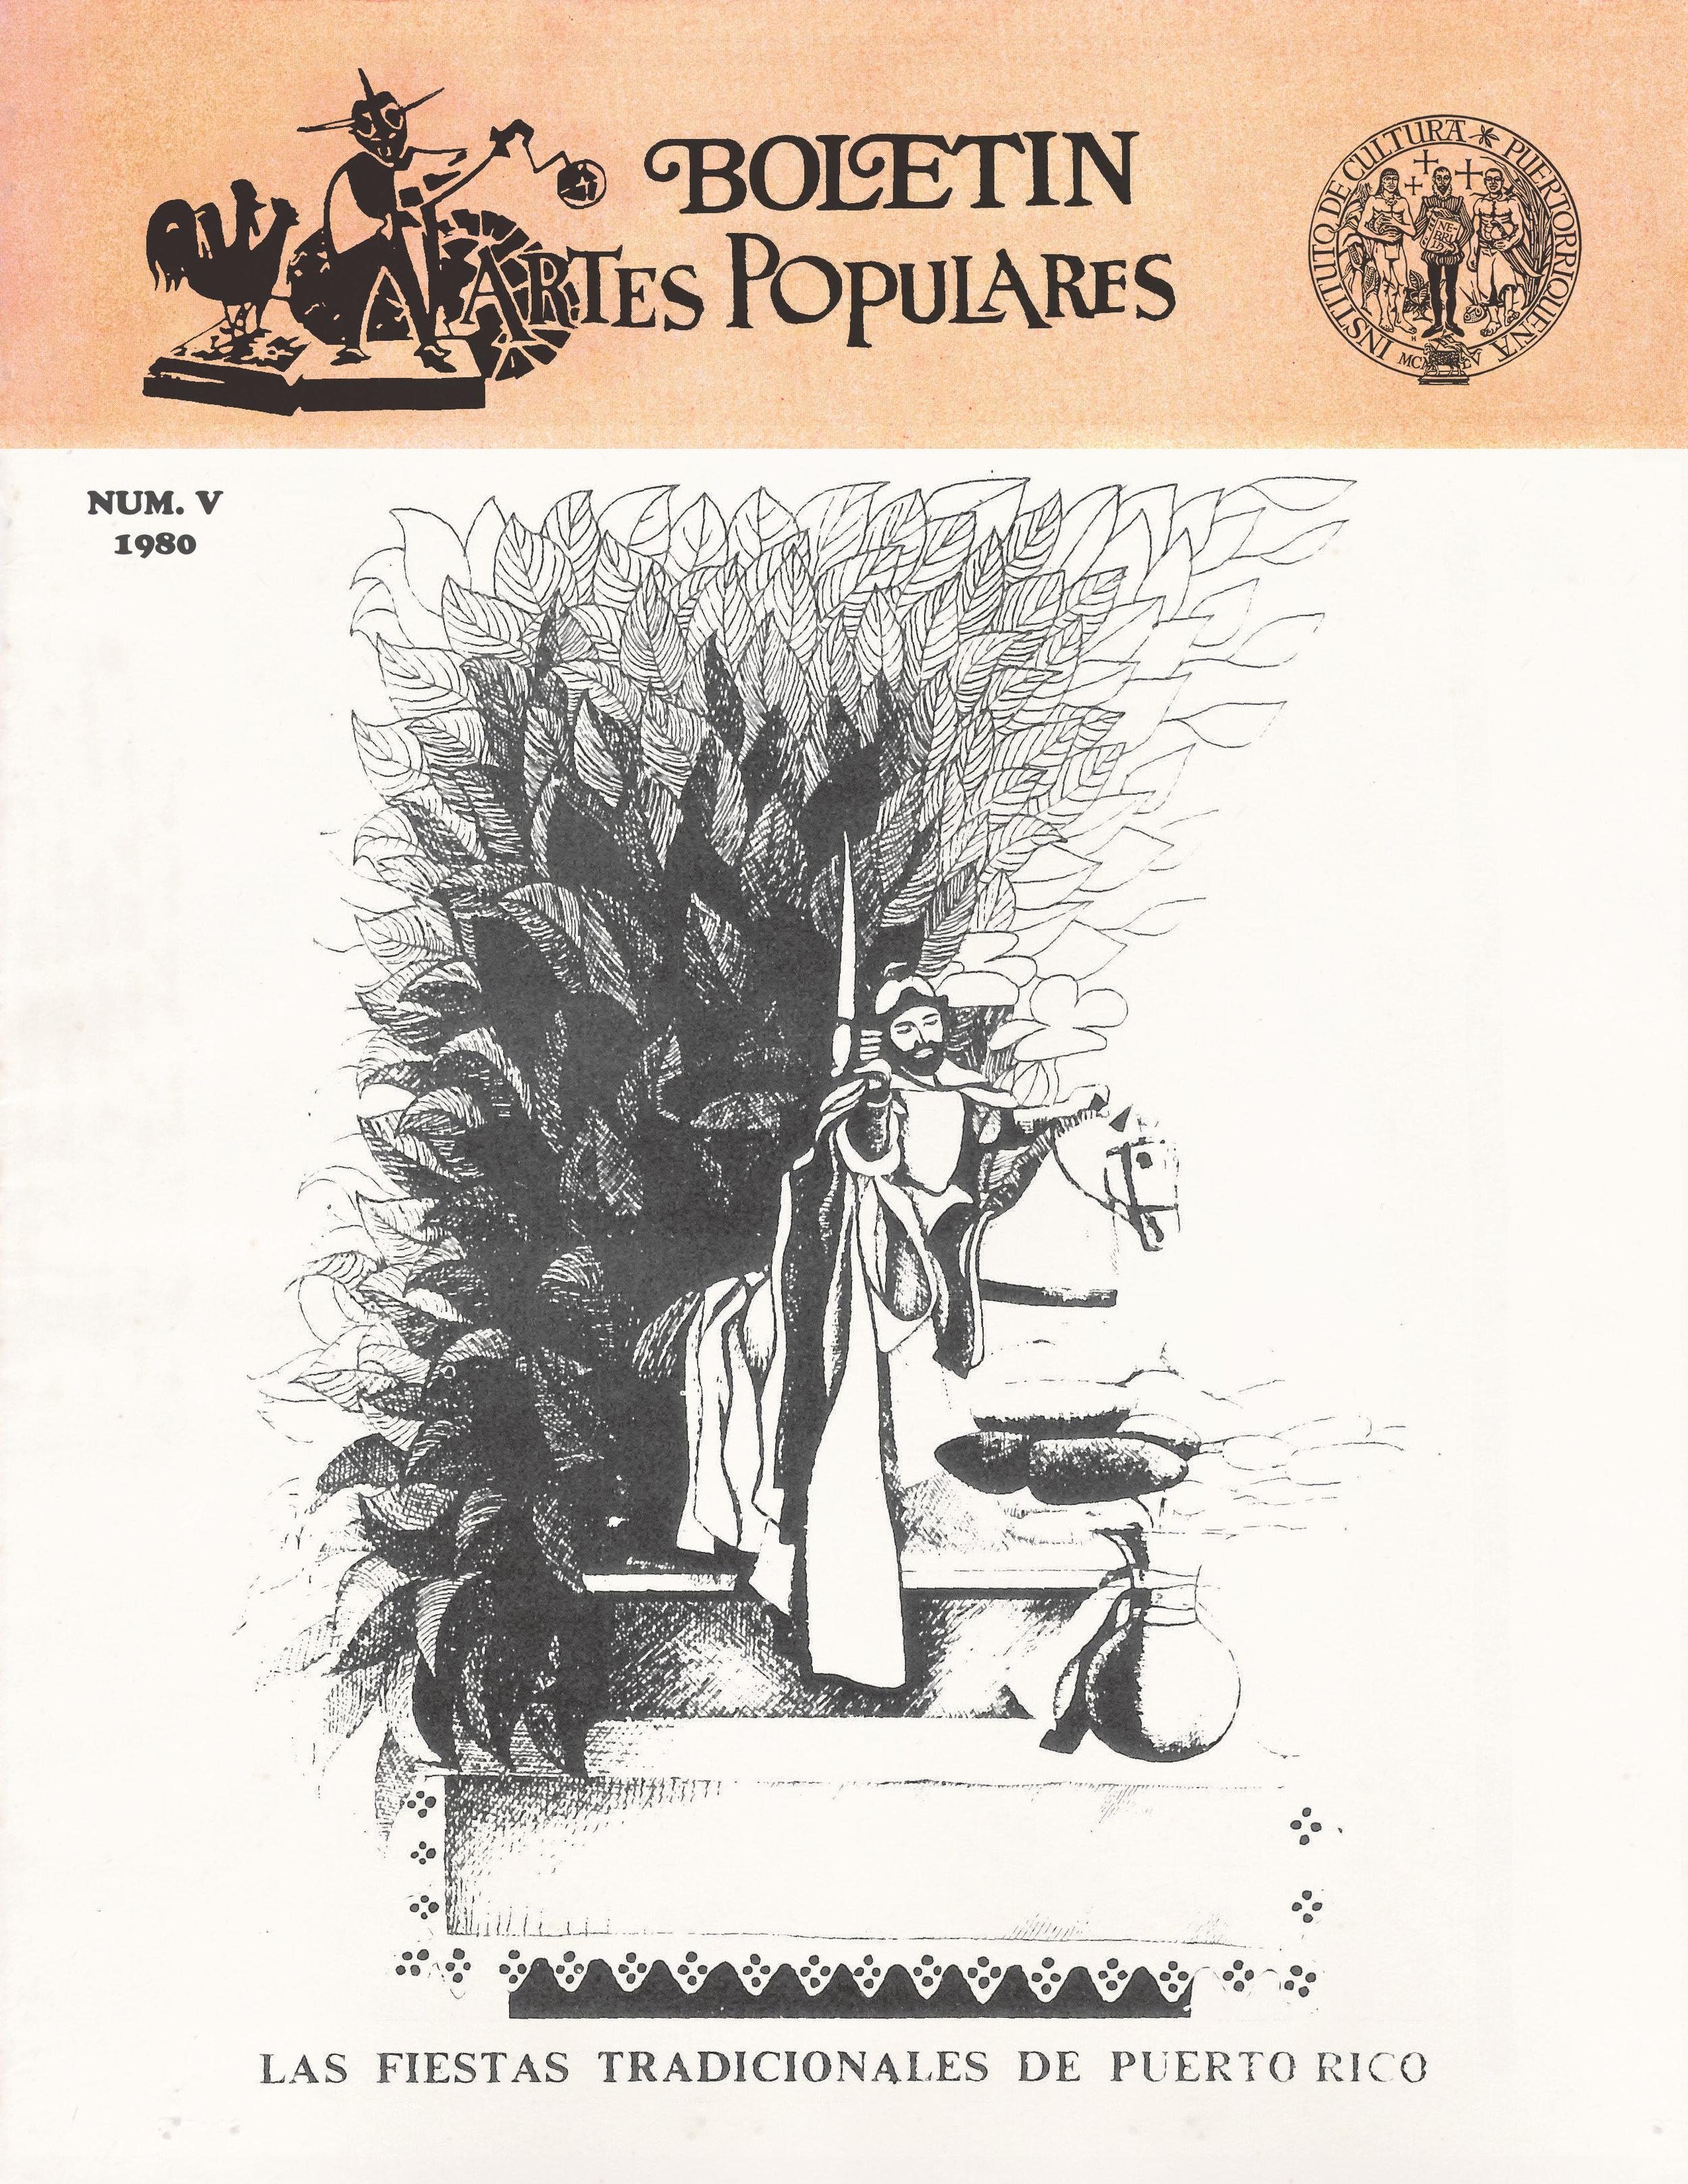 Boletín de Artes Populares #5.jpg